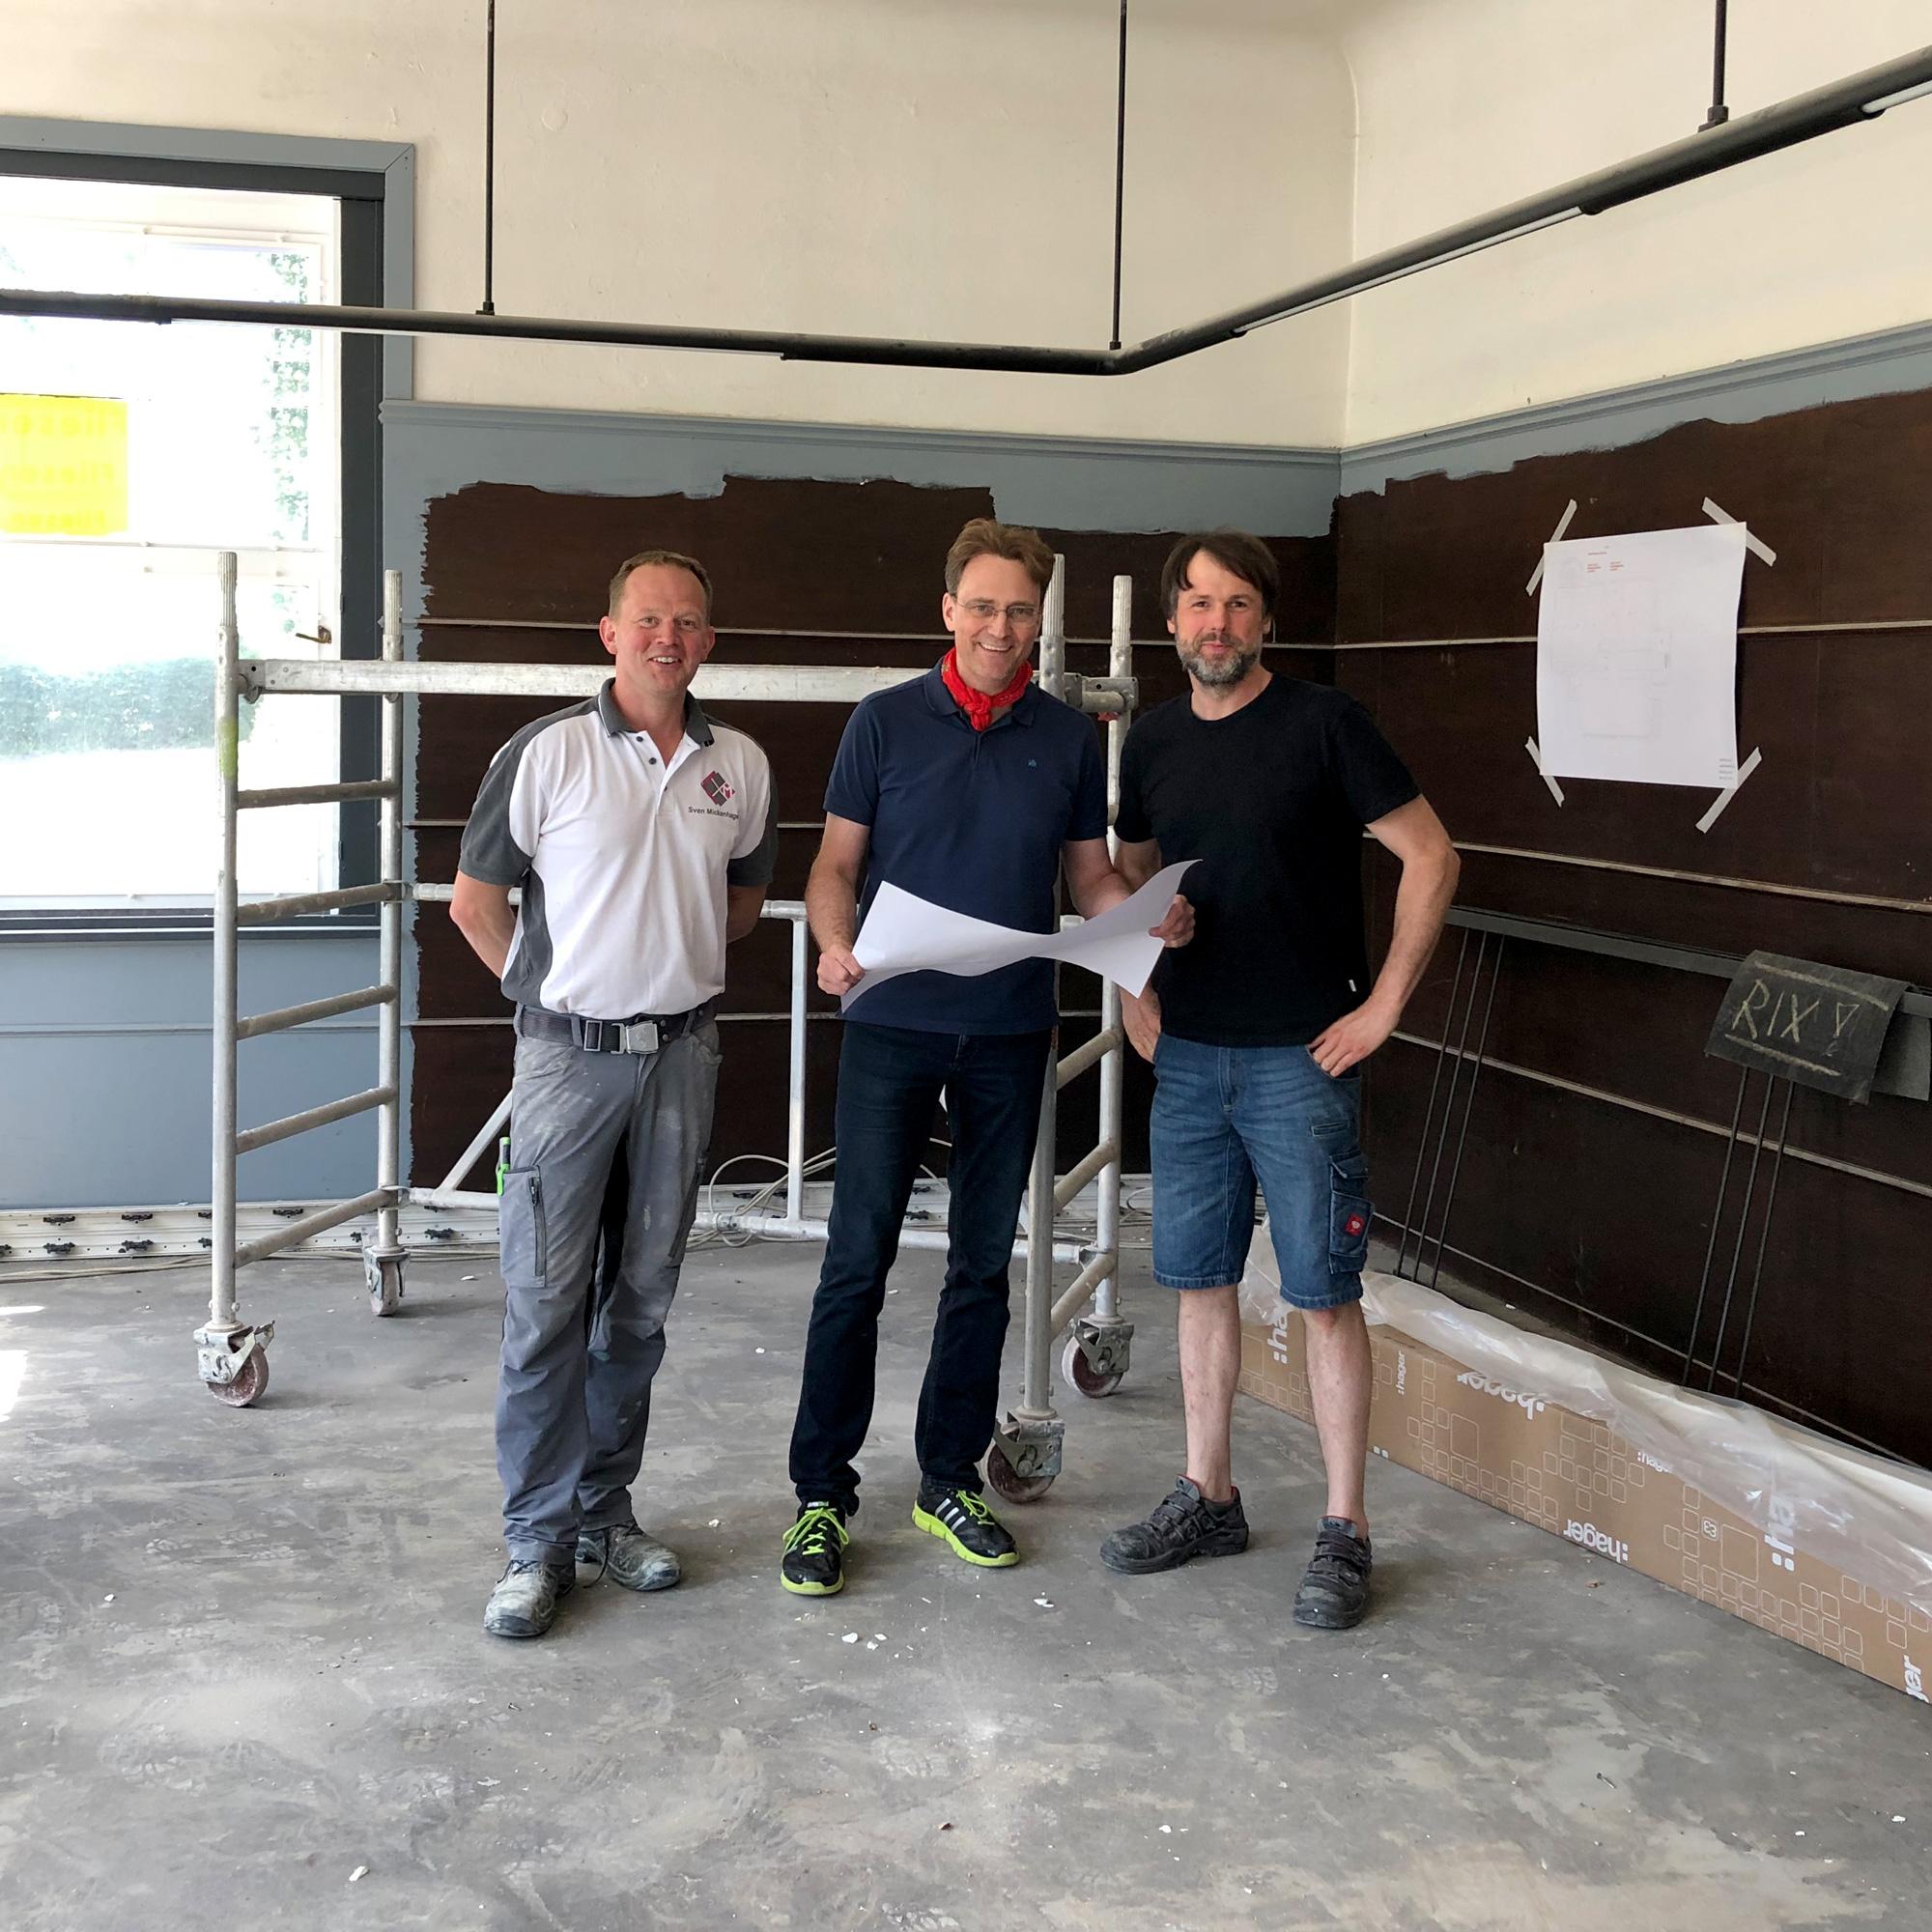 Sven Mickenhagen, Nils Rix und Christian Kaulbach